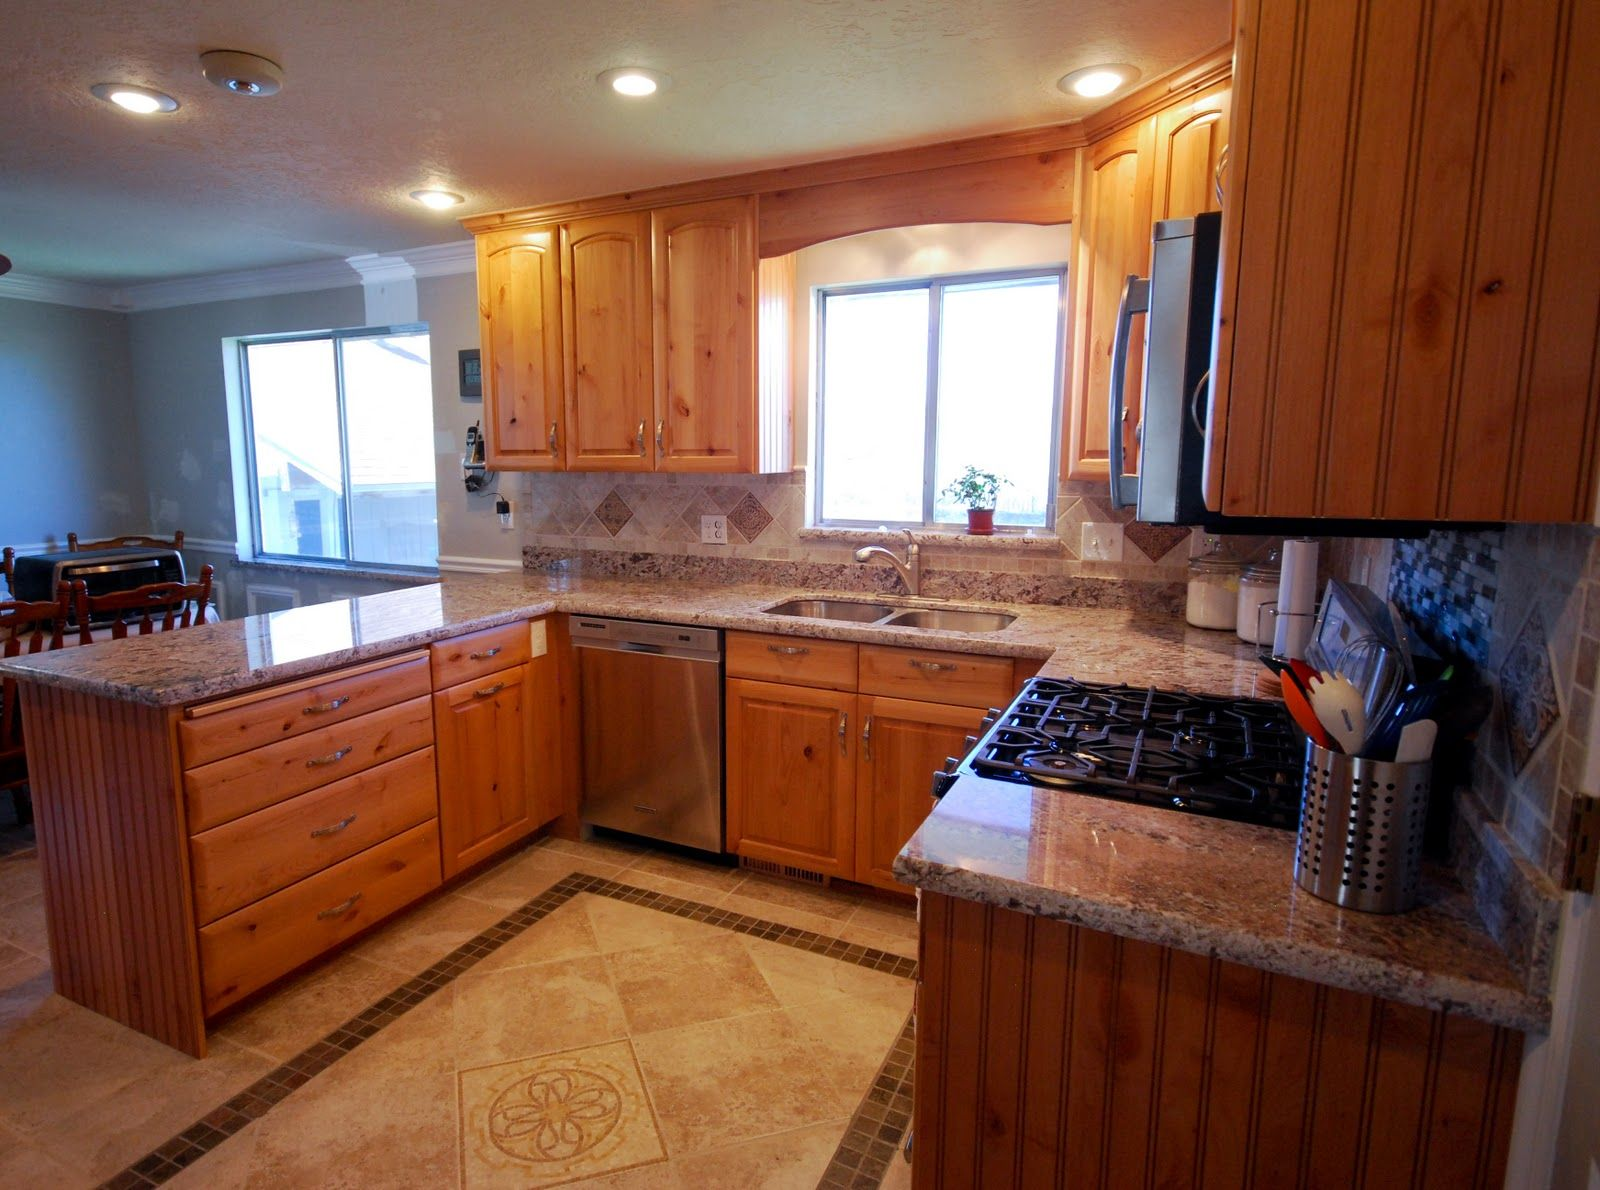 The Granite Gurus: New Bianco Antico granite Kitchen | Granite ...